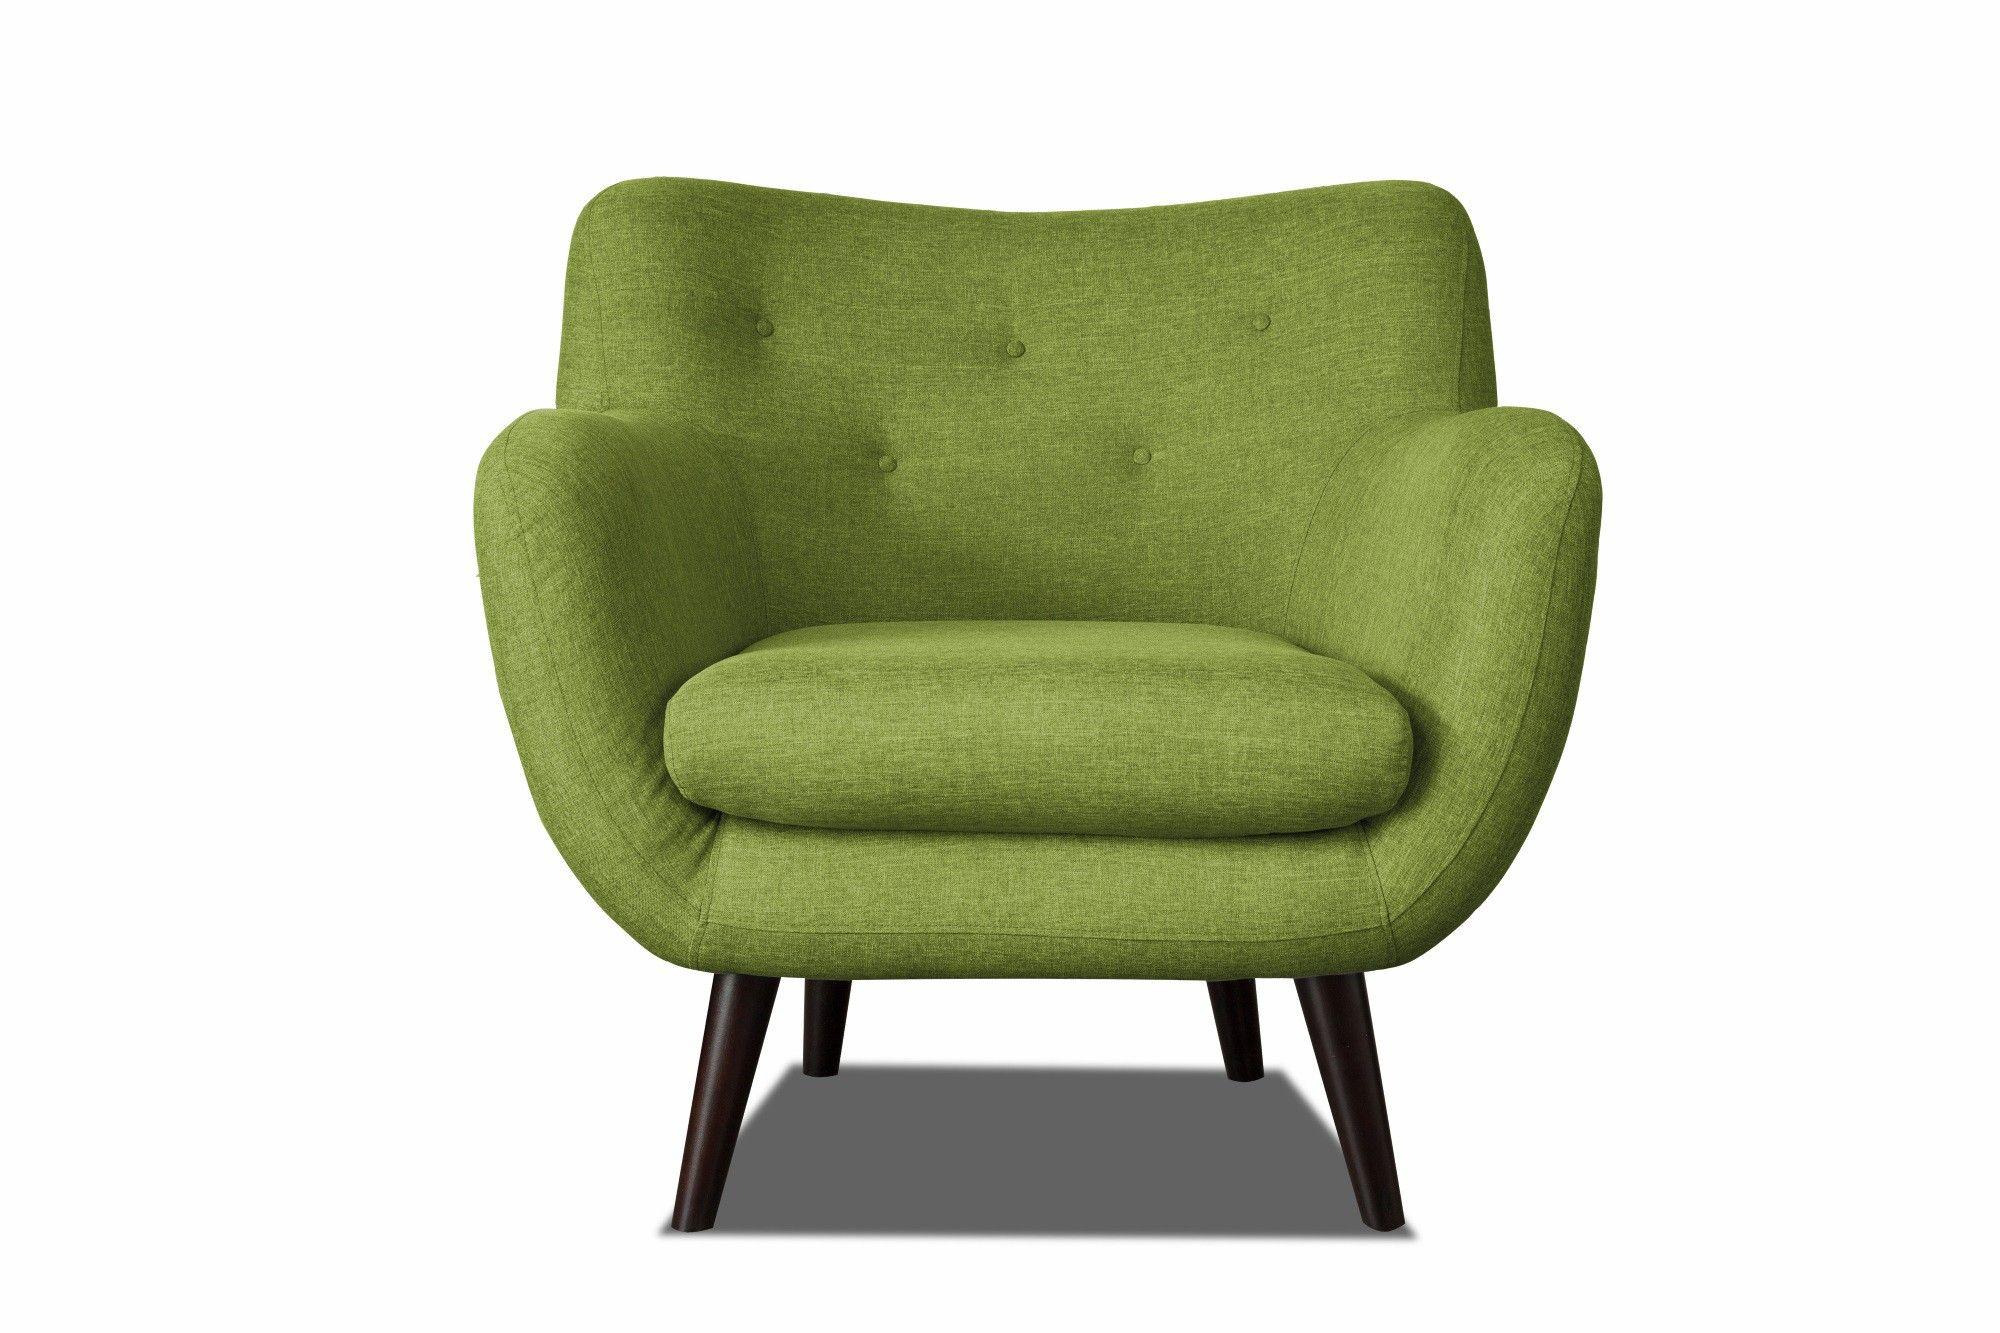 Fauteuil design en tissu vert Axelle